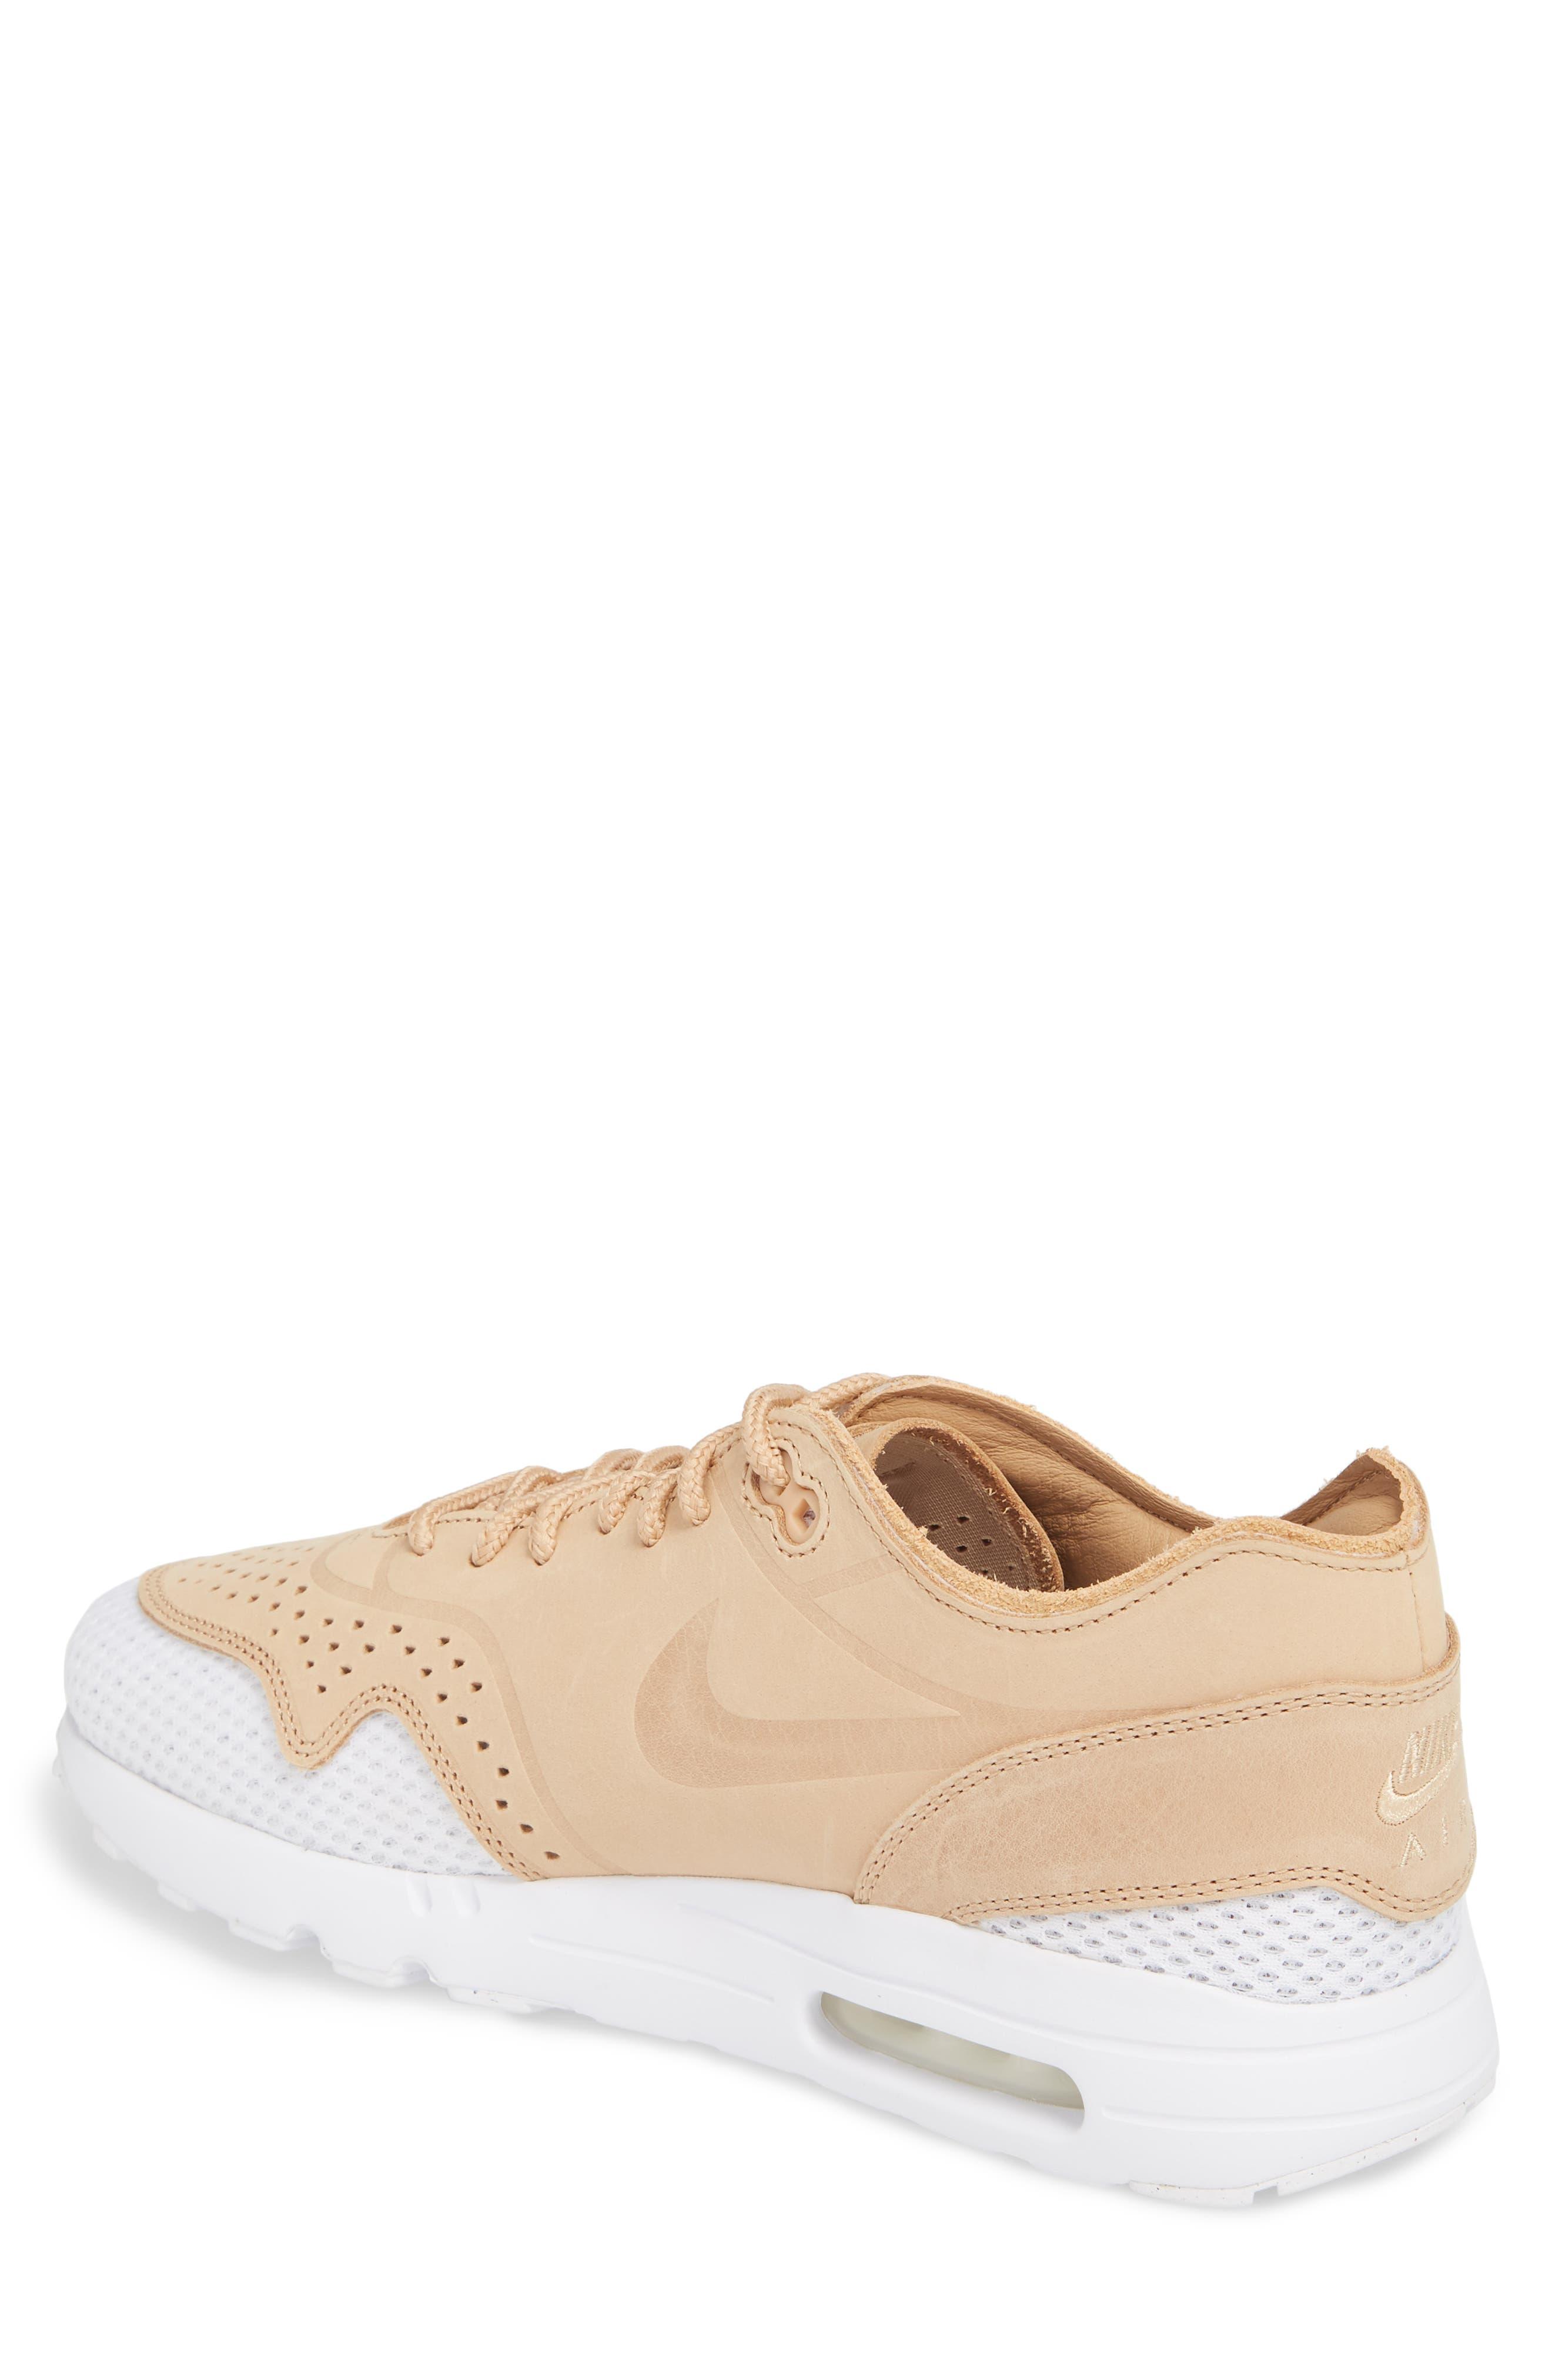 Air Max 1 Ultra 2.0 Premium Sneaker,                             Alternate thumbnail 2, color,                             VACHETTA TAN/ WHITE